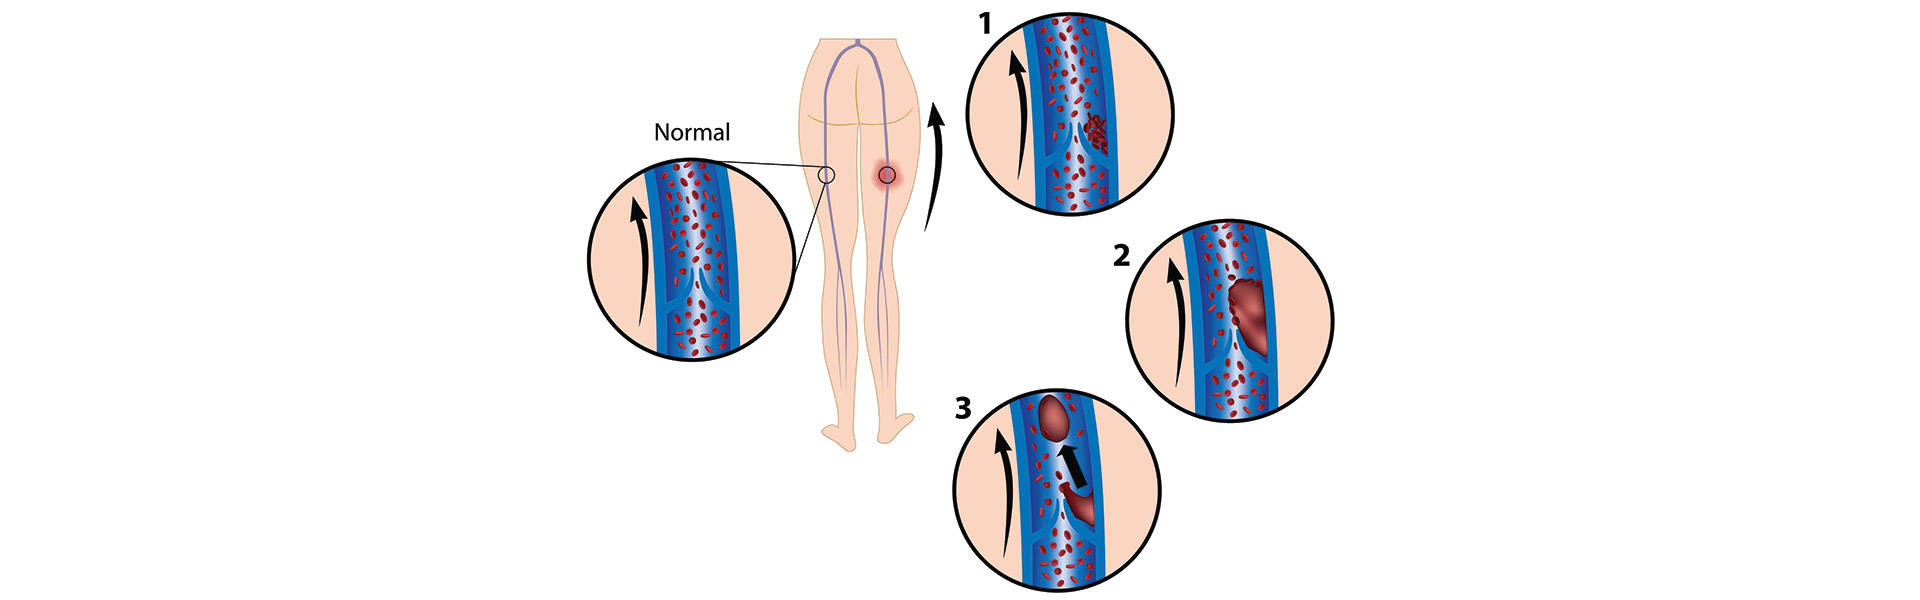 Evaluation and treatment of penile thrombophlebitis